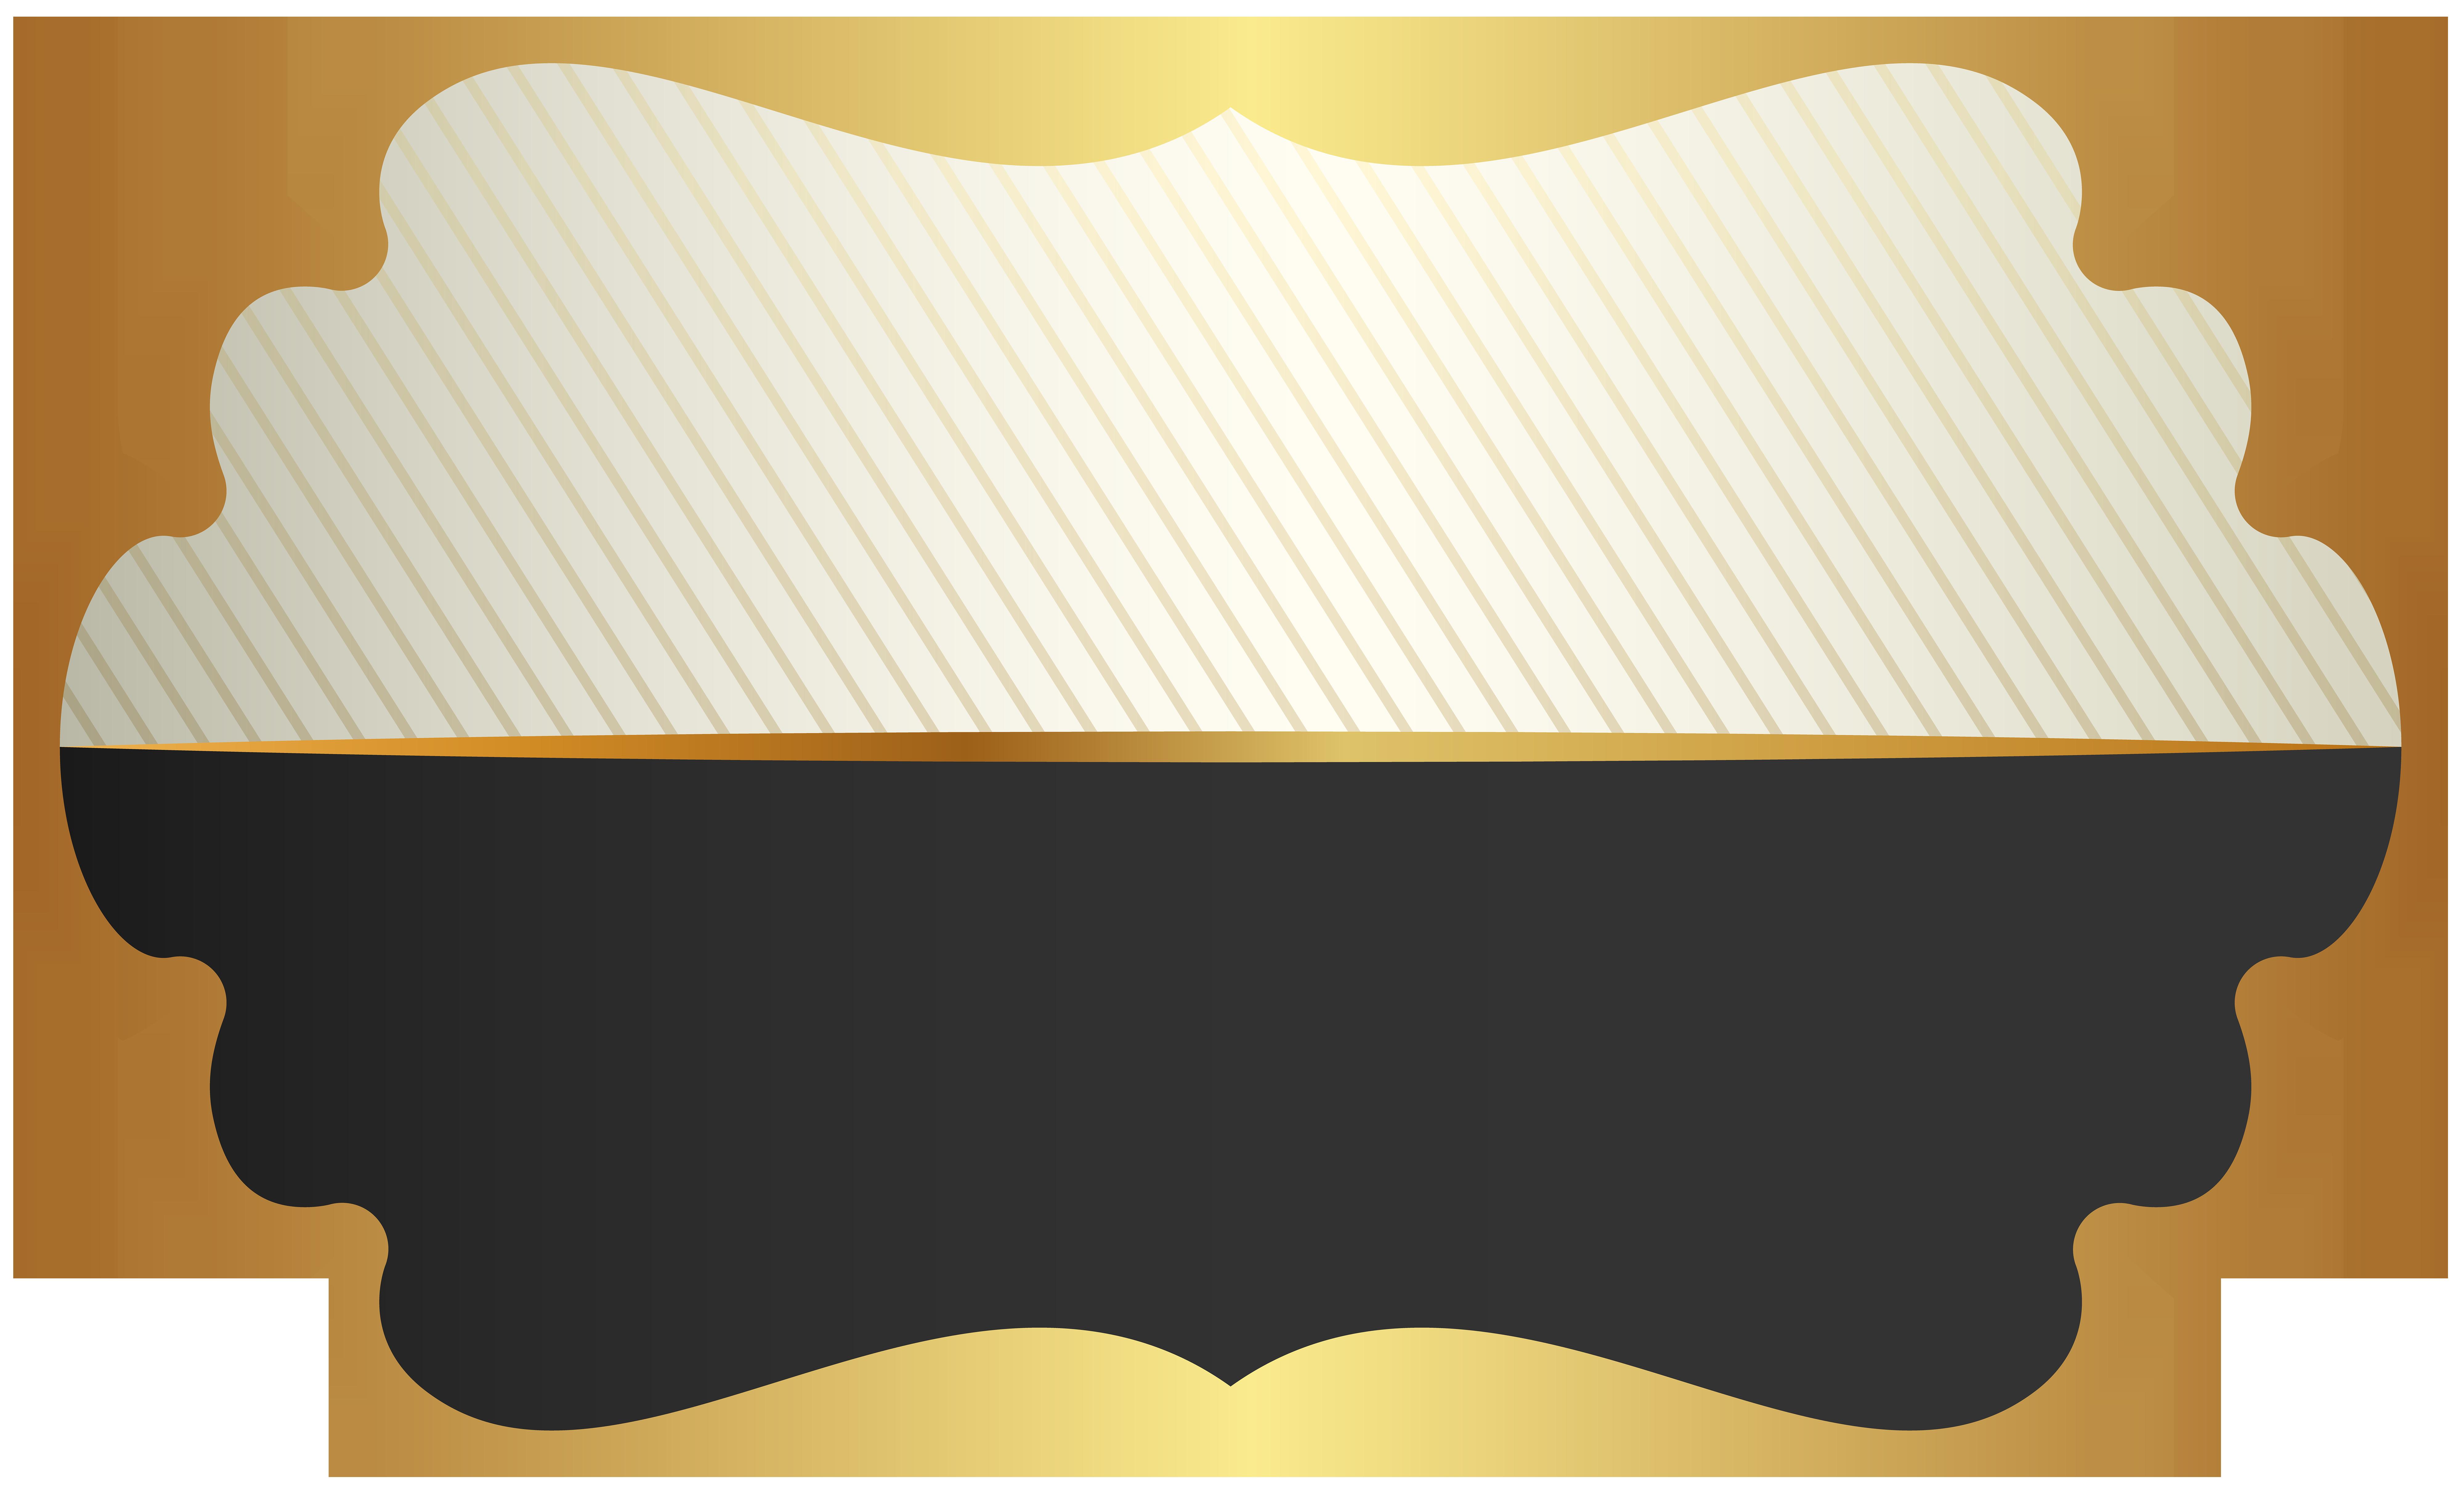 Label Template Black Clip Art PNG Image.